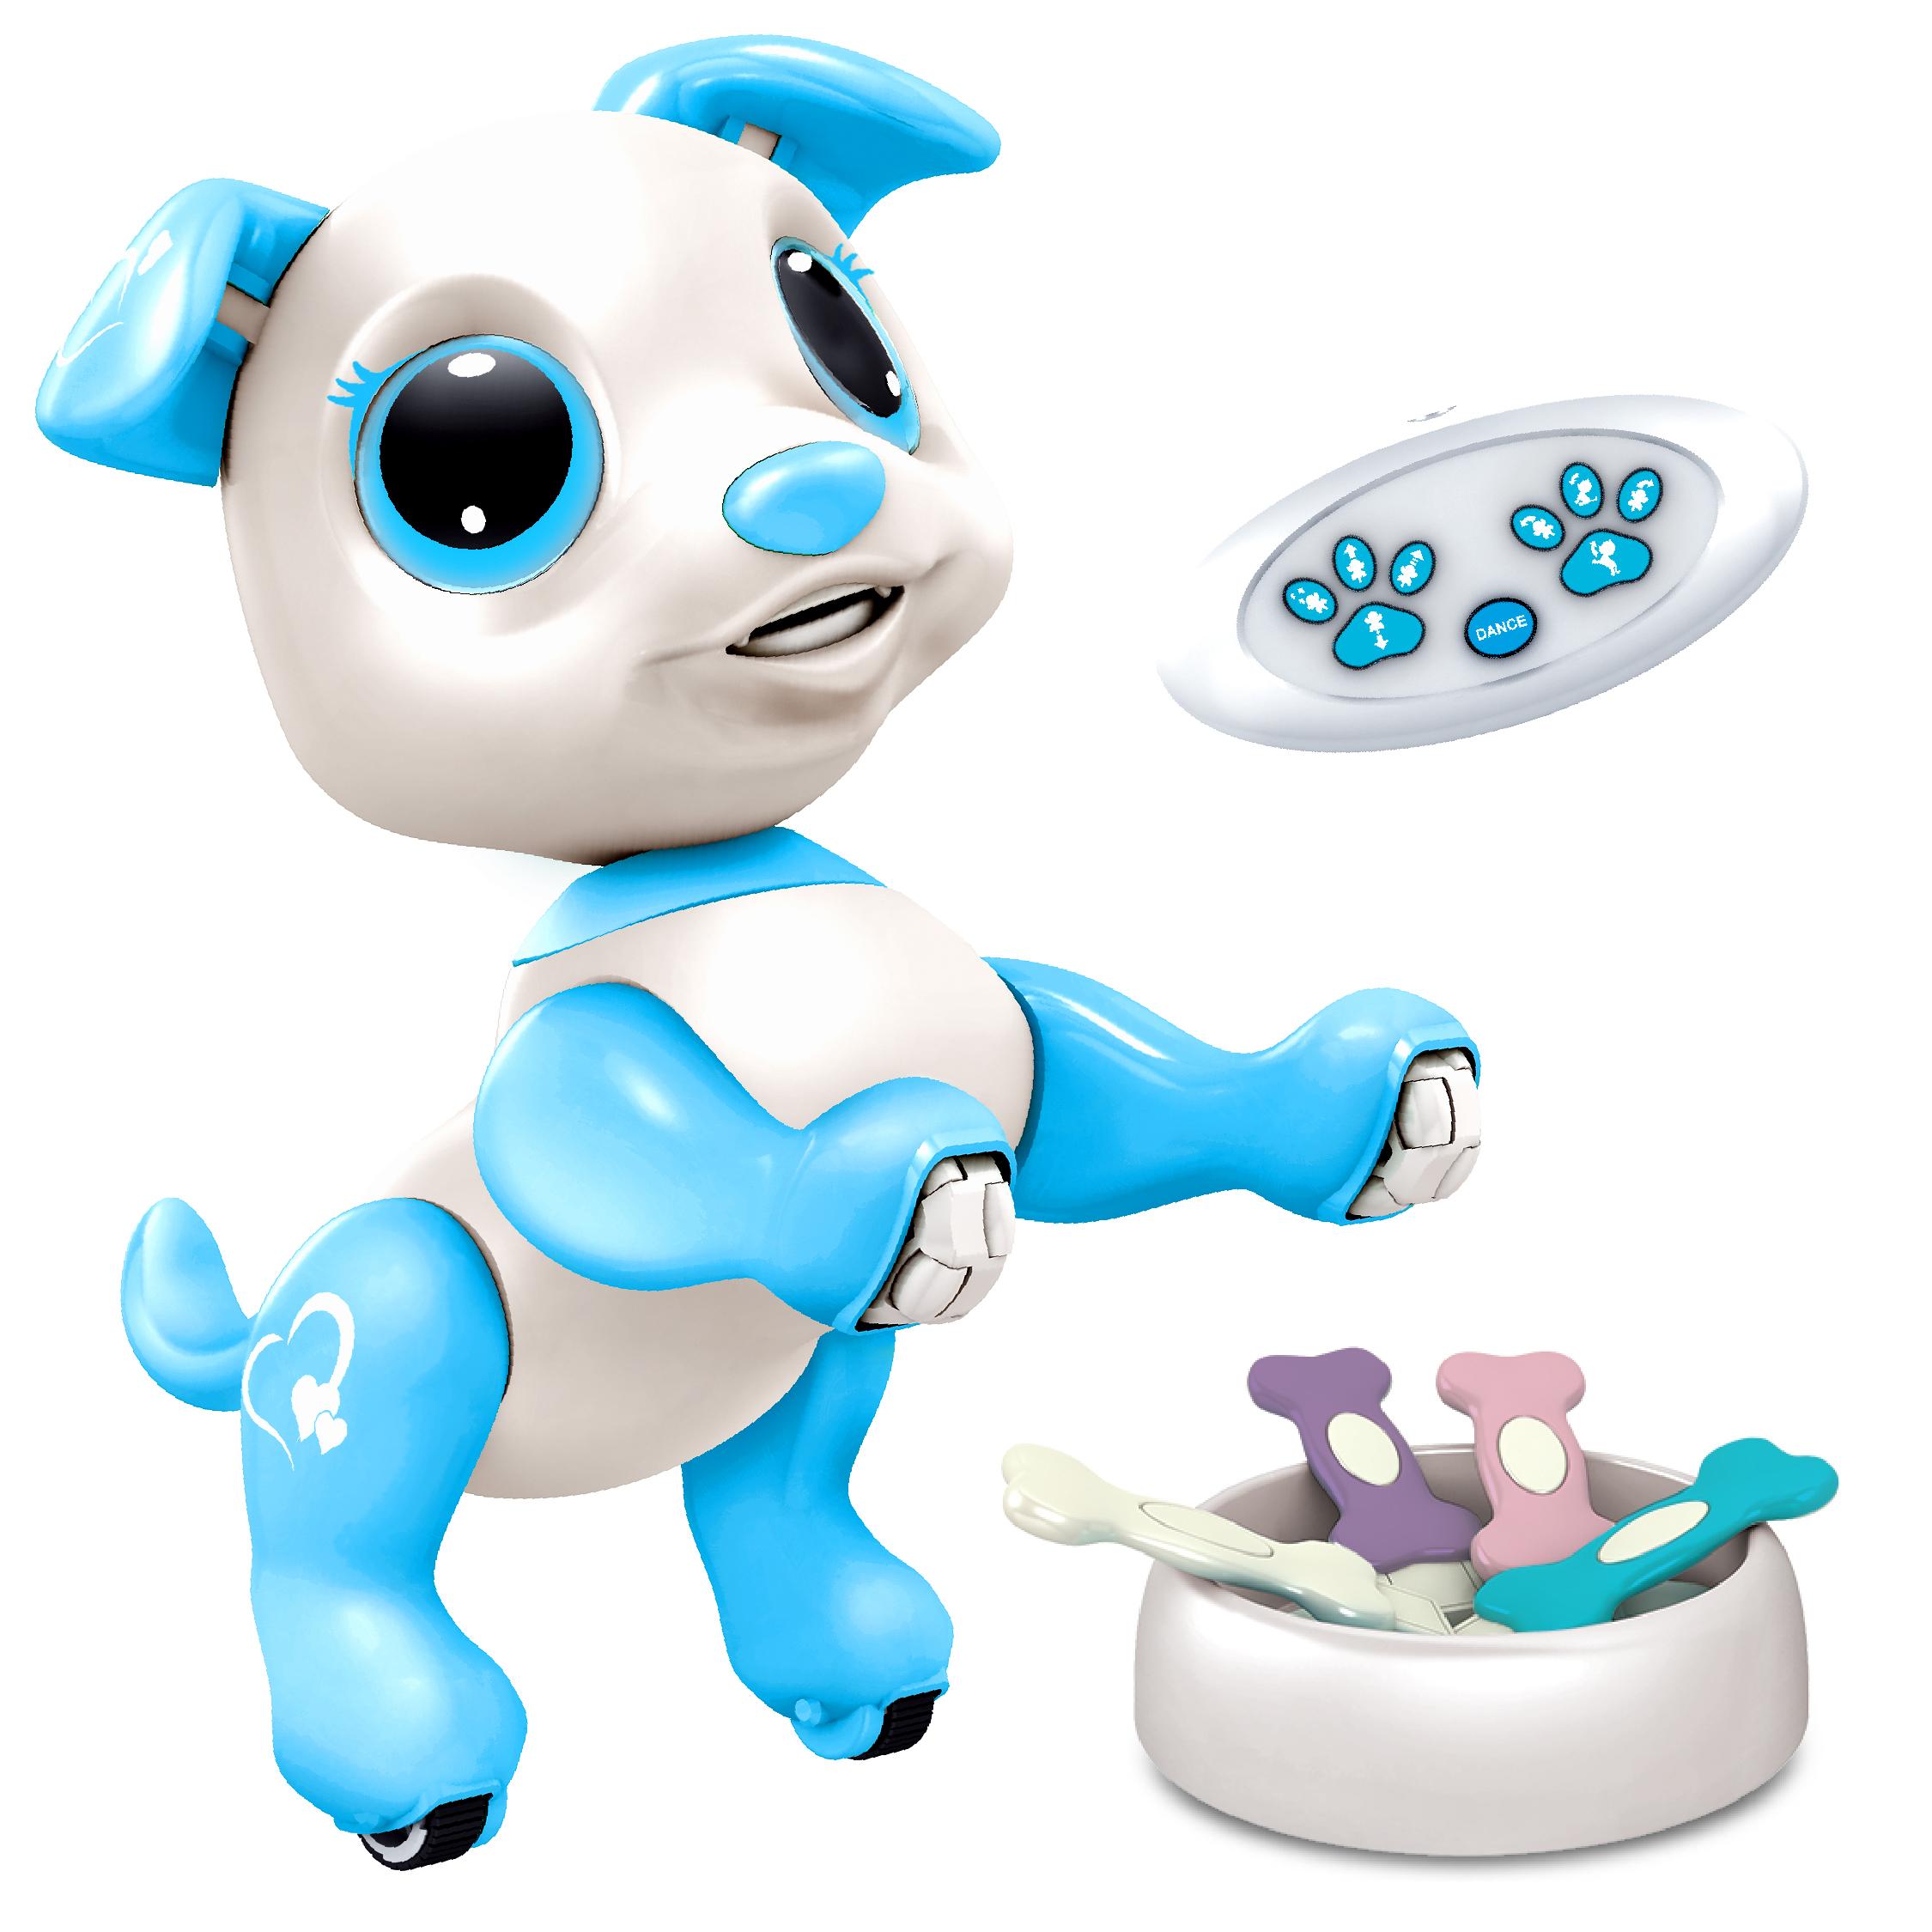 Robo Pets Puppy Dog